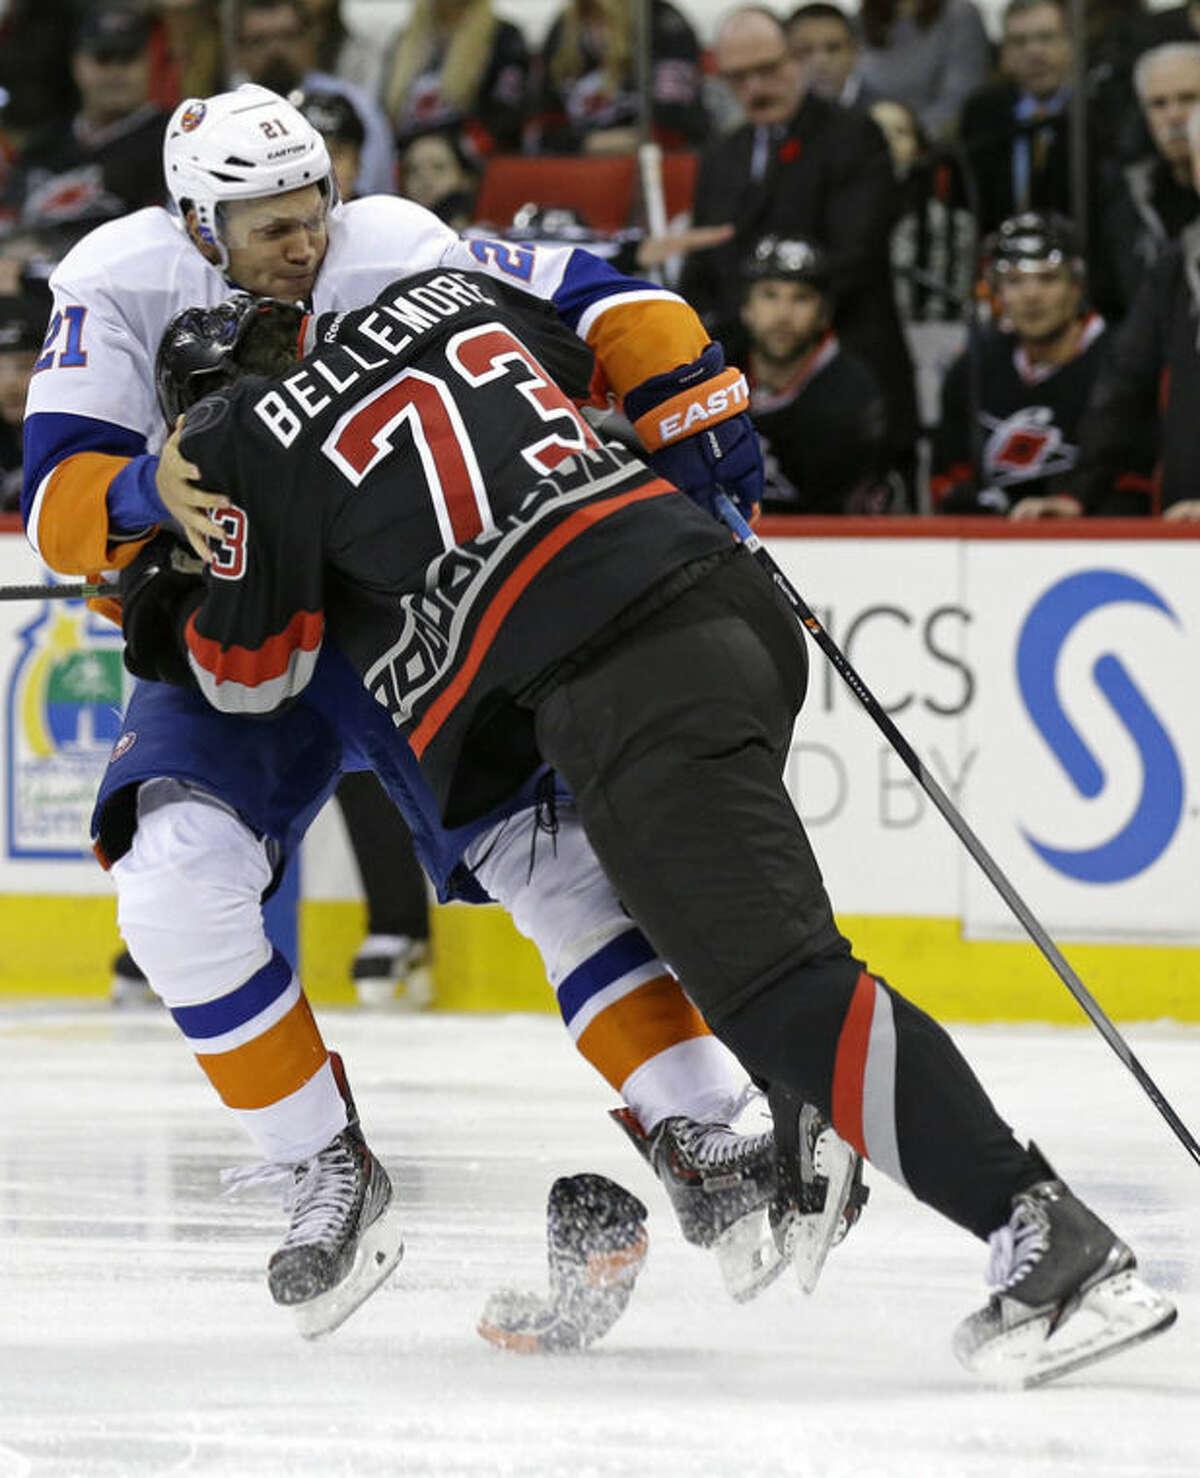 Carolina Hurricanes' Brett Bellemore (73) checks New York Islanders' Kyle Okposo (21) during the first period of an NHL hockey game in Raleigh, N.C., Thursday, Nov. 7, 2013. (AP Photo/Gerry Broome)